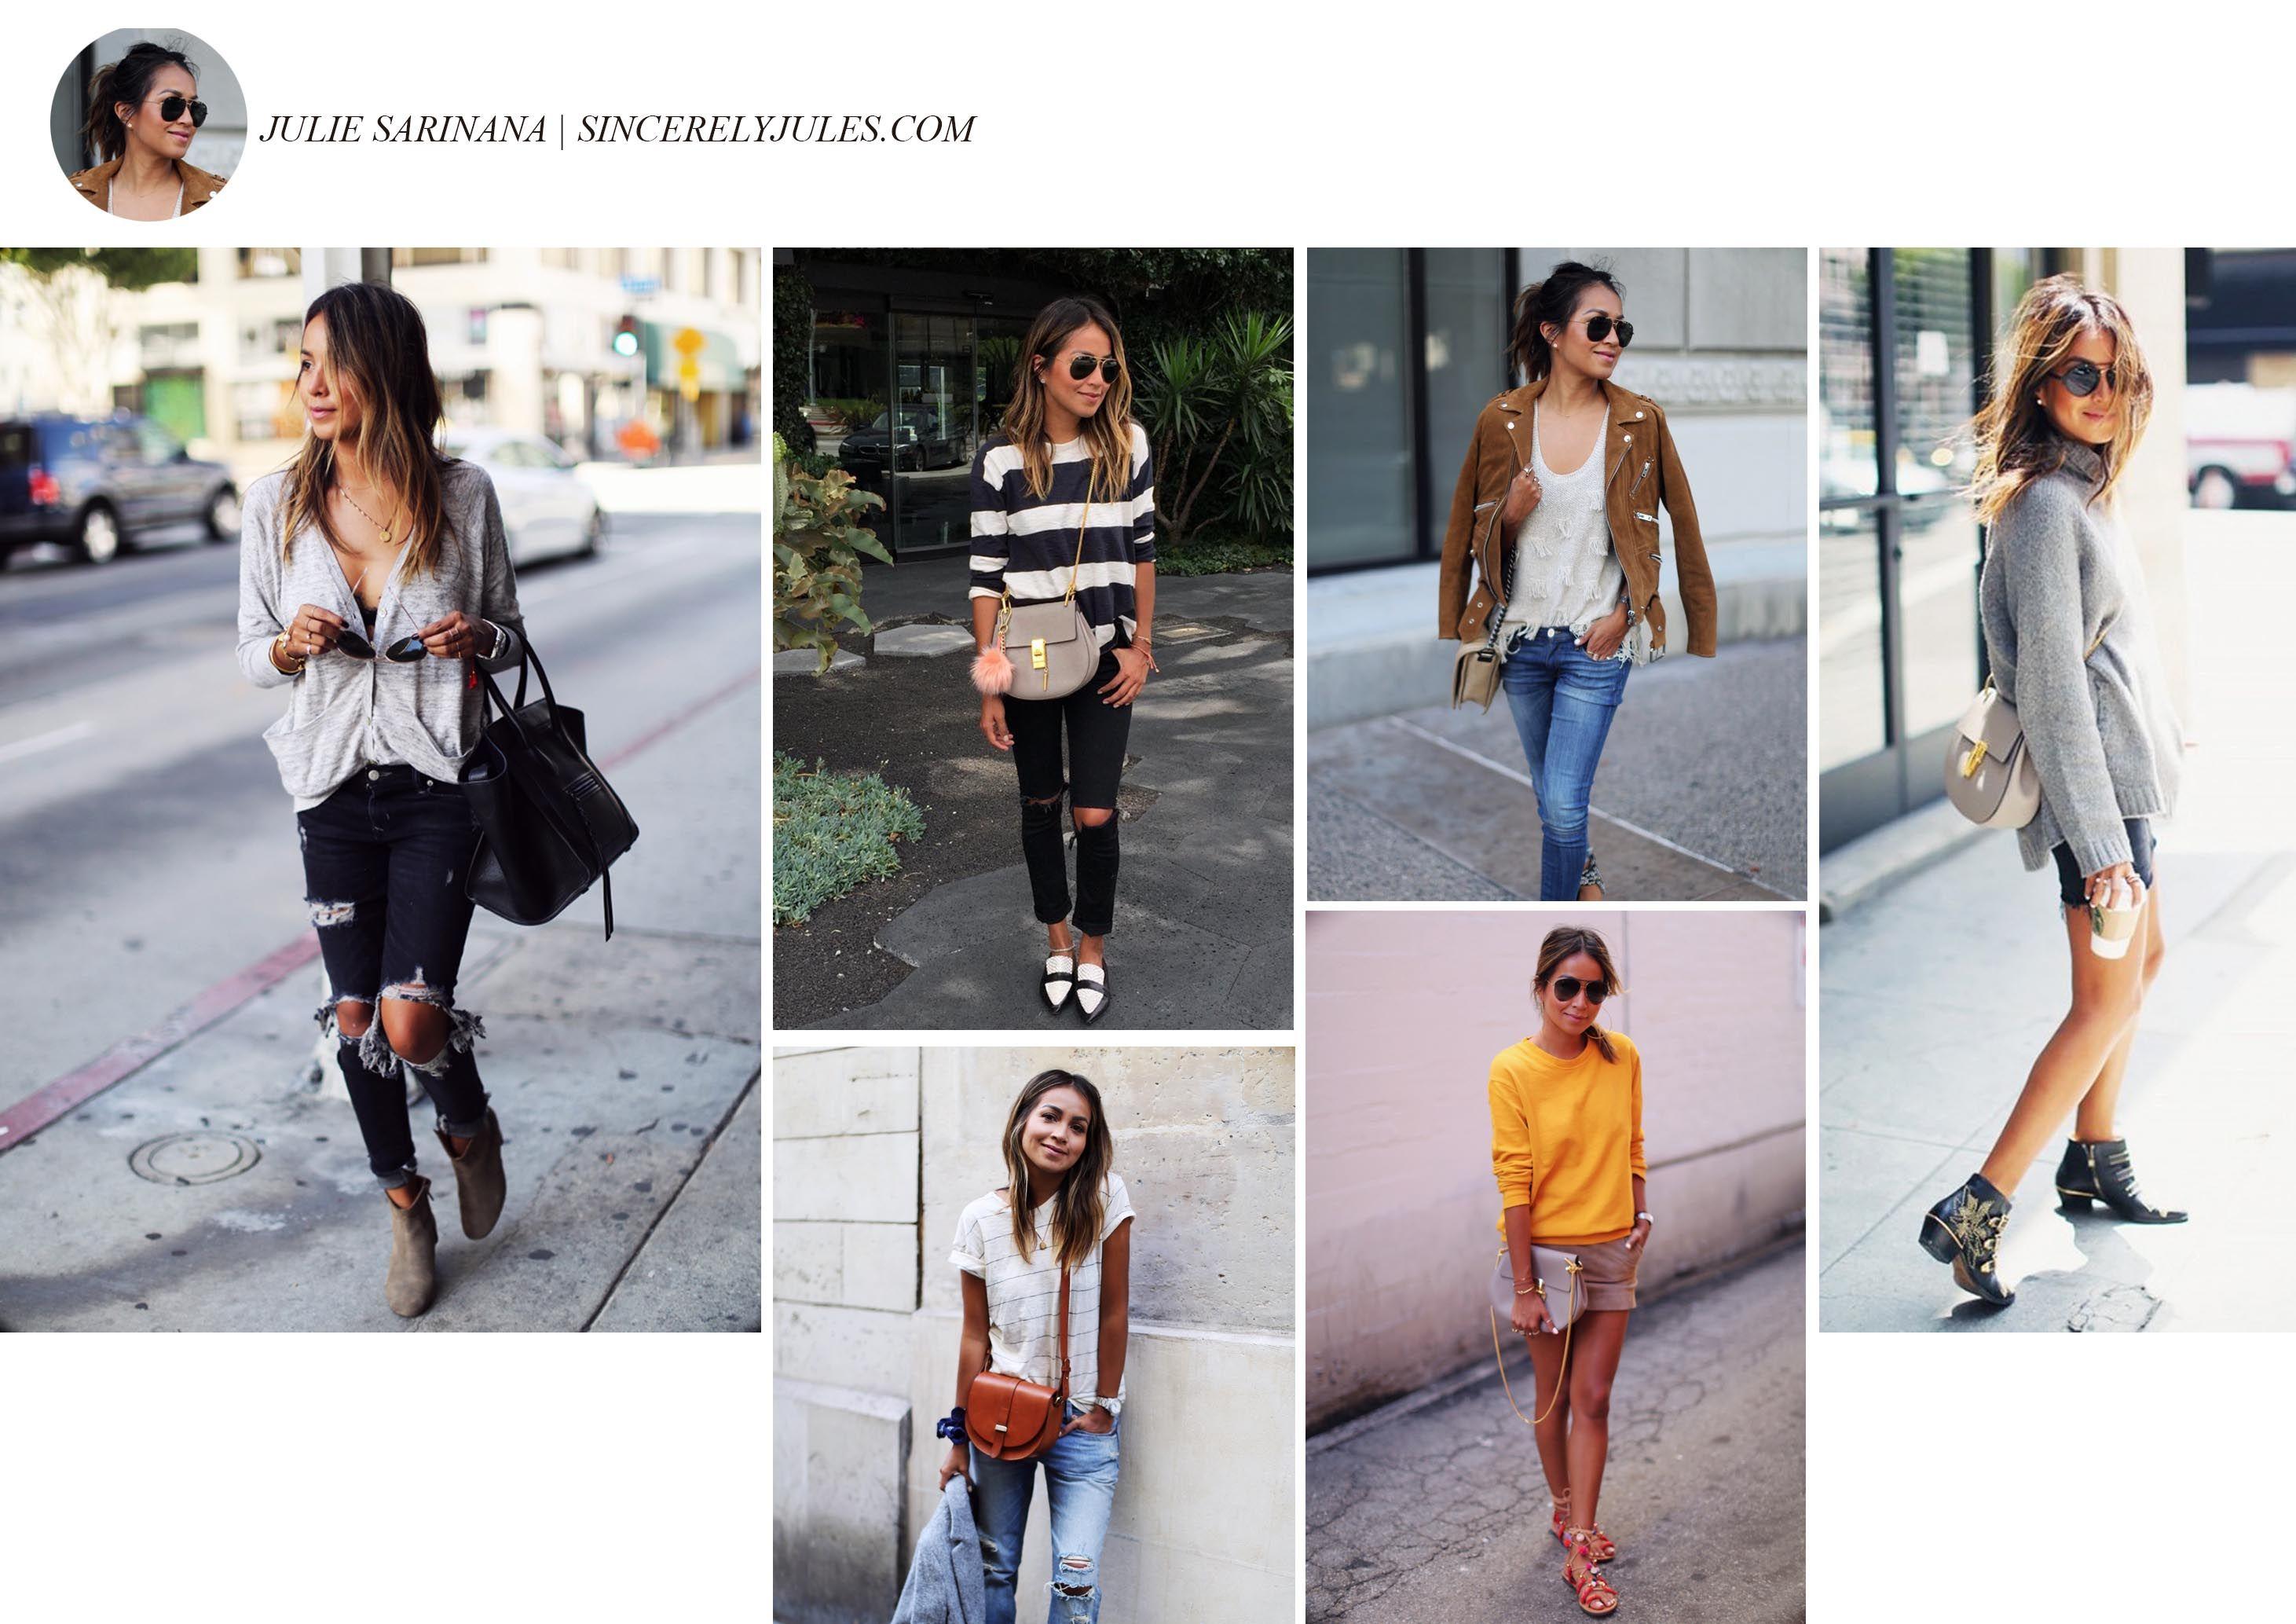 top-10-blogger-julie-sarinana-sincerely-jules-e52940f4100e9feddd766e029a43d6fd.jpg